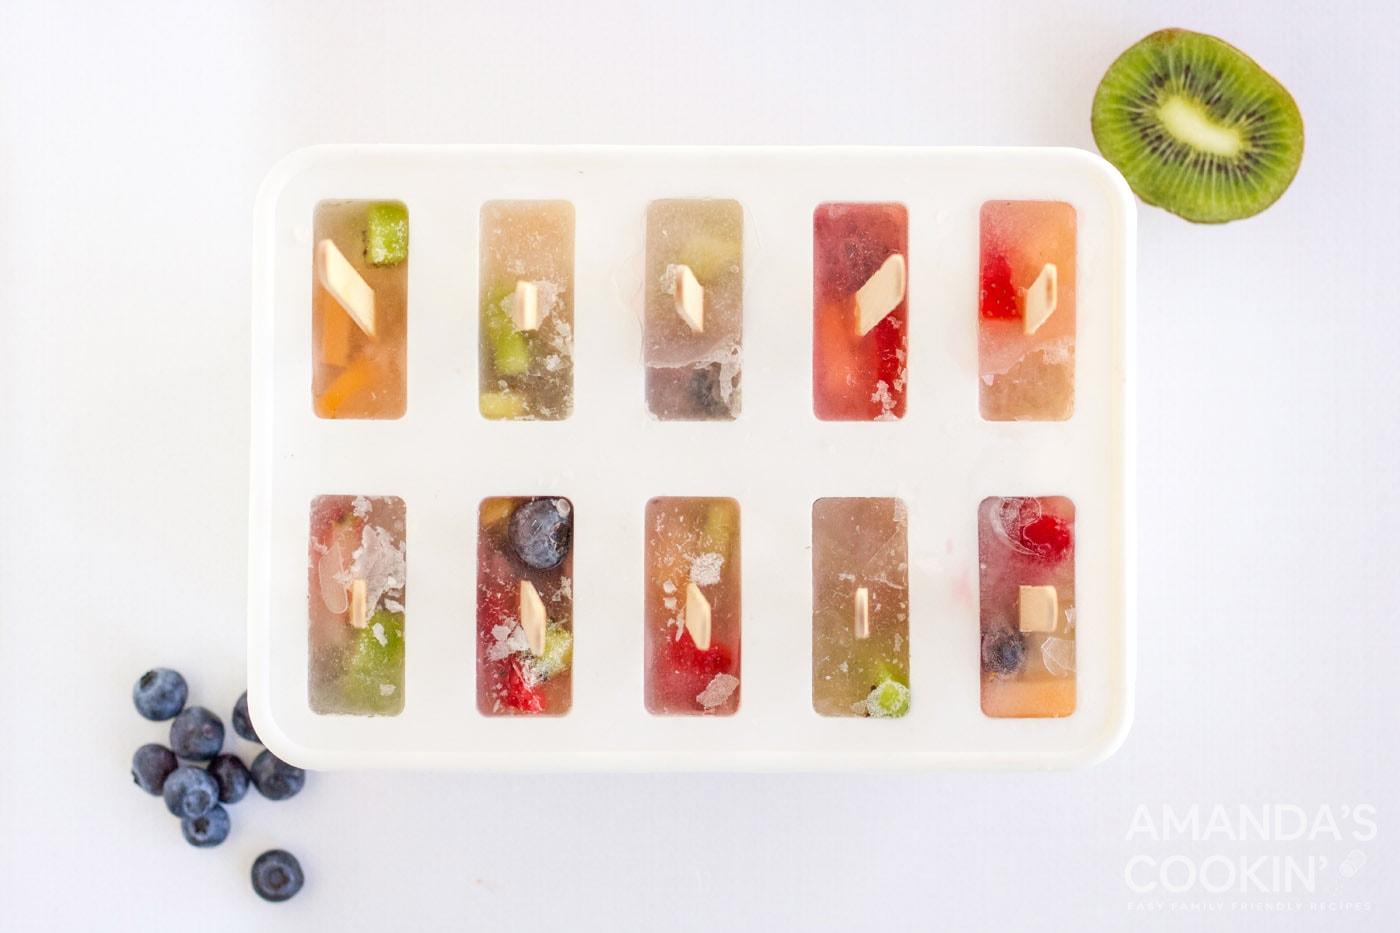 frozen fruit popsicles in a mold